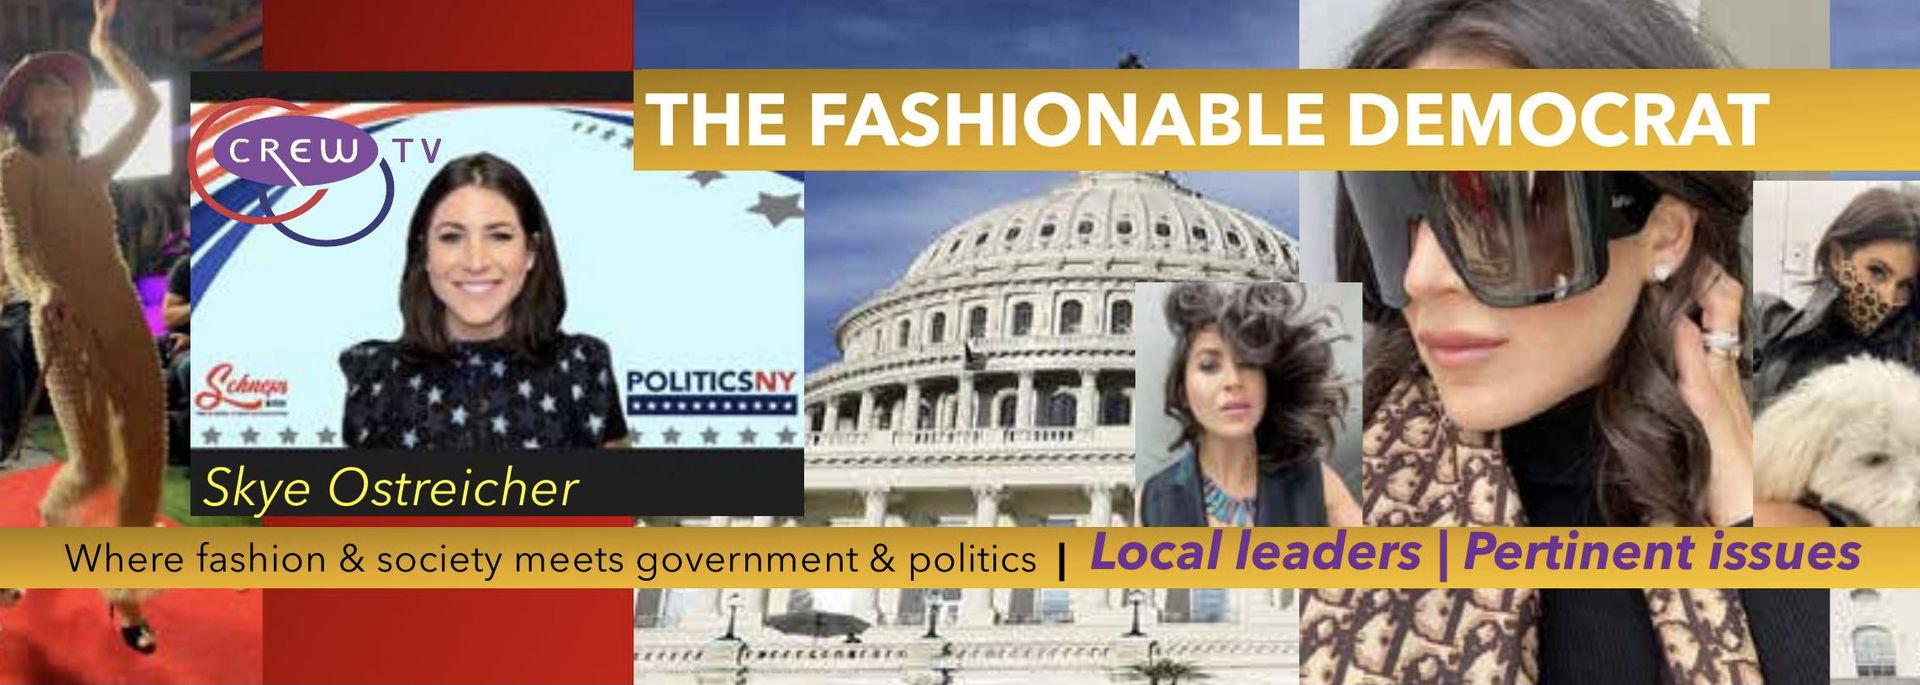 The Fashionable Democrat